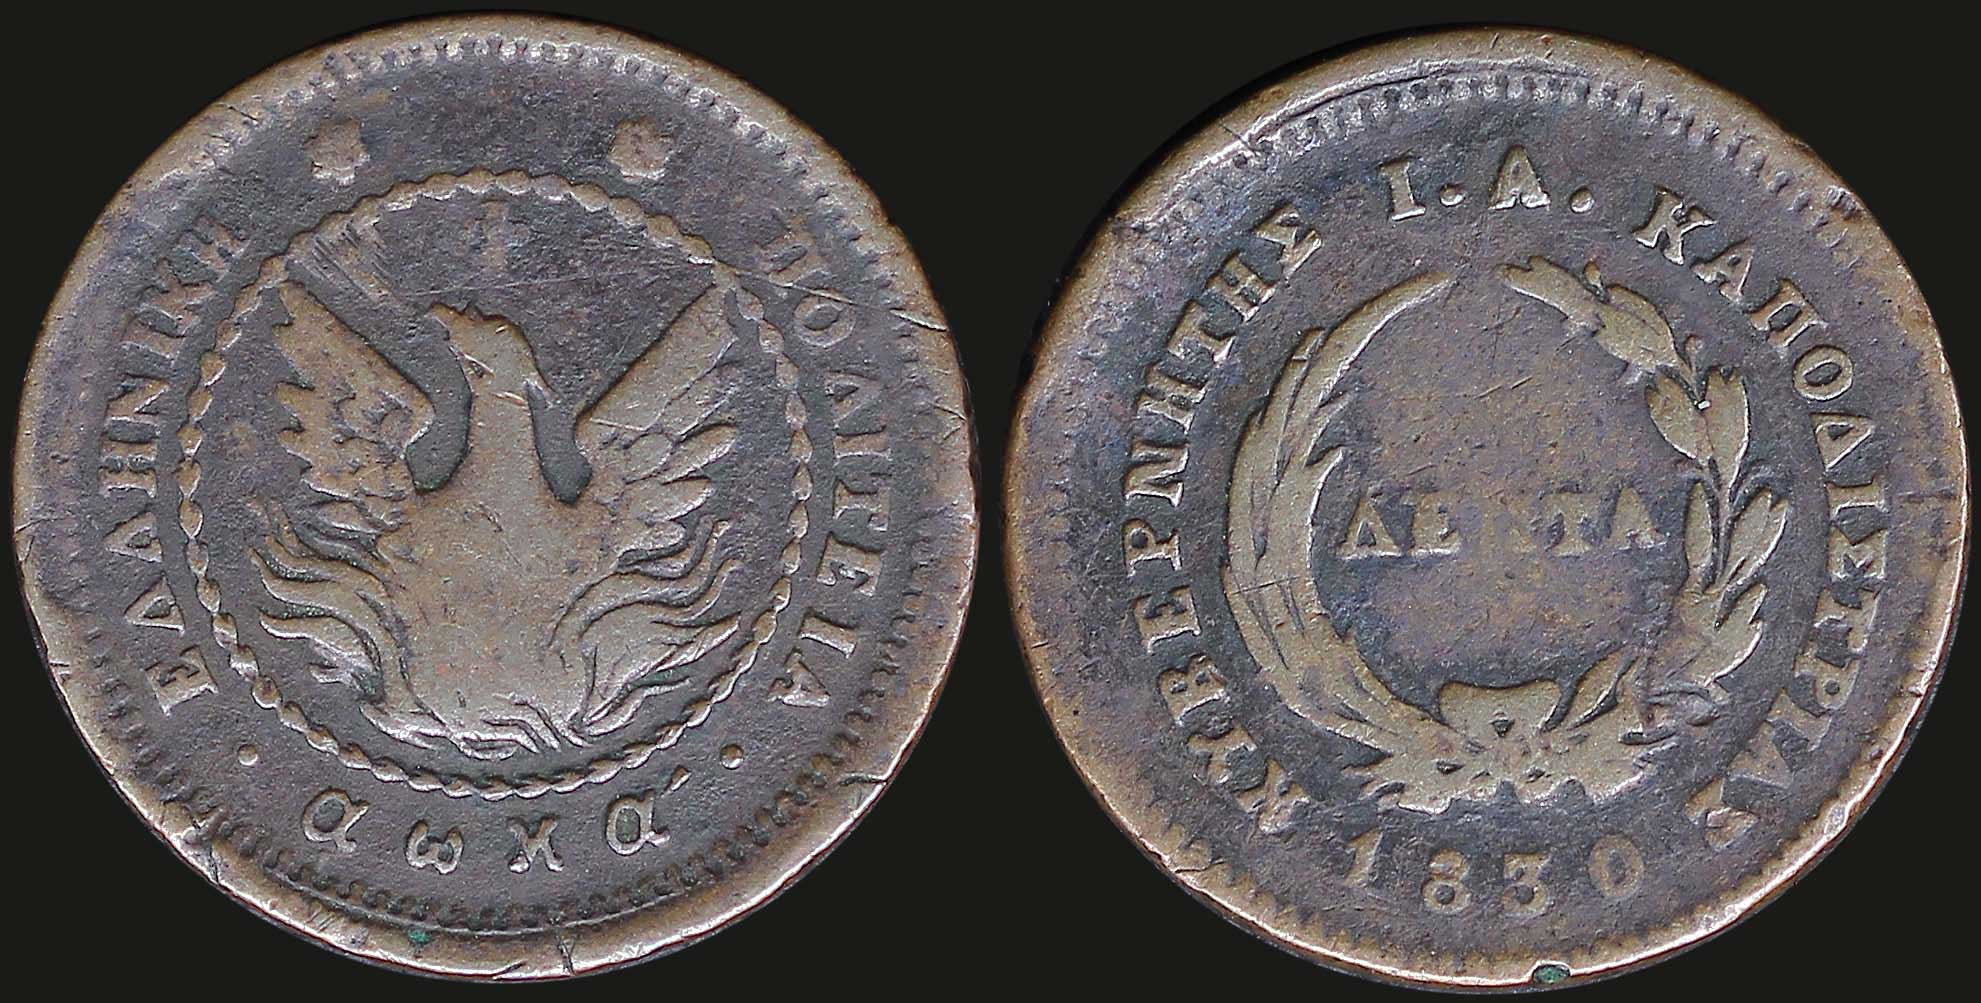 Lot 6020 - -  COINS & TOKENS governor capodistrias -  A. Karamitsos Public & Live Bid Auction 636 Coins, Medals & Banknotes